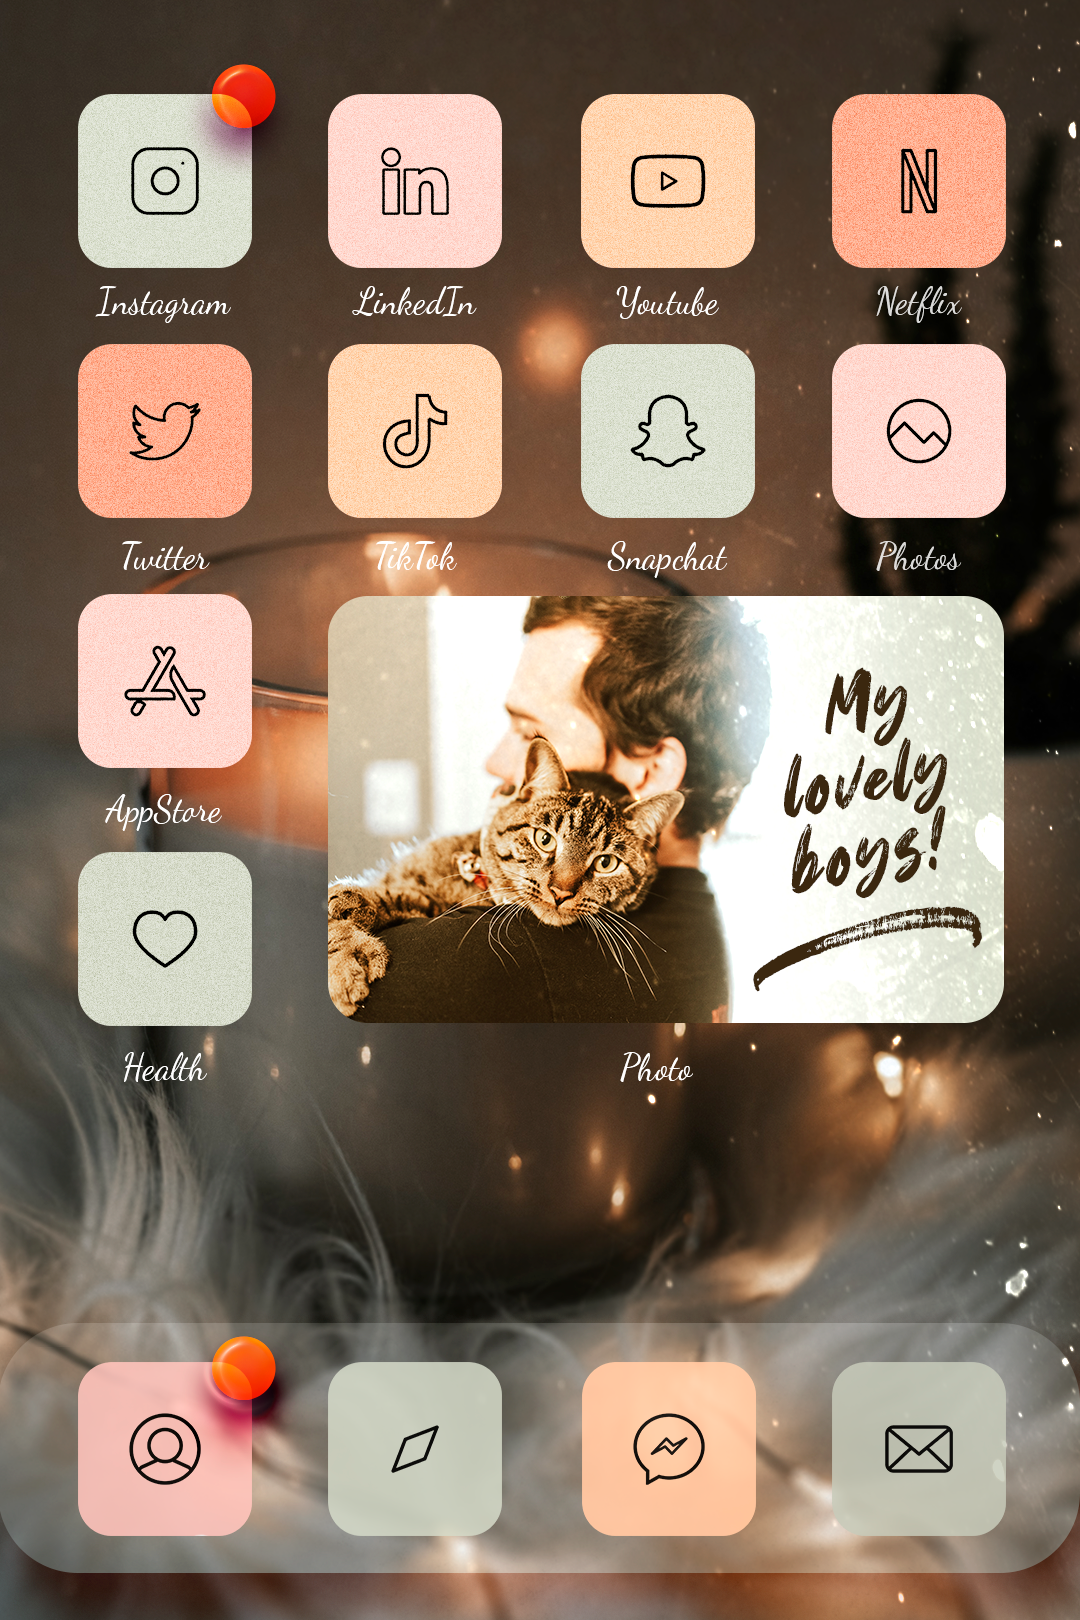 Stylish Icons Widgets Iphone Wallpaper App Iphone App Layout Iphone Design